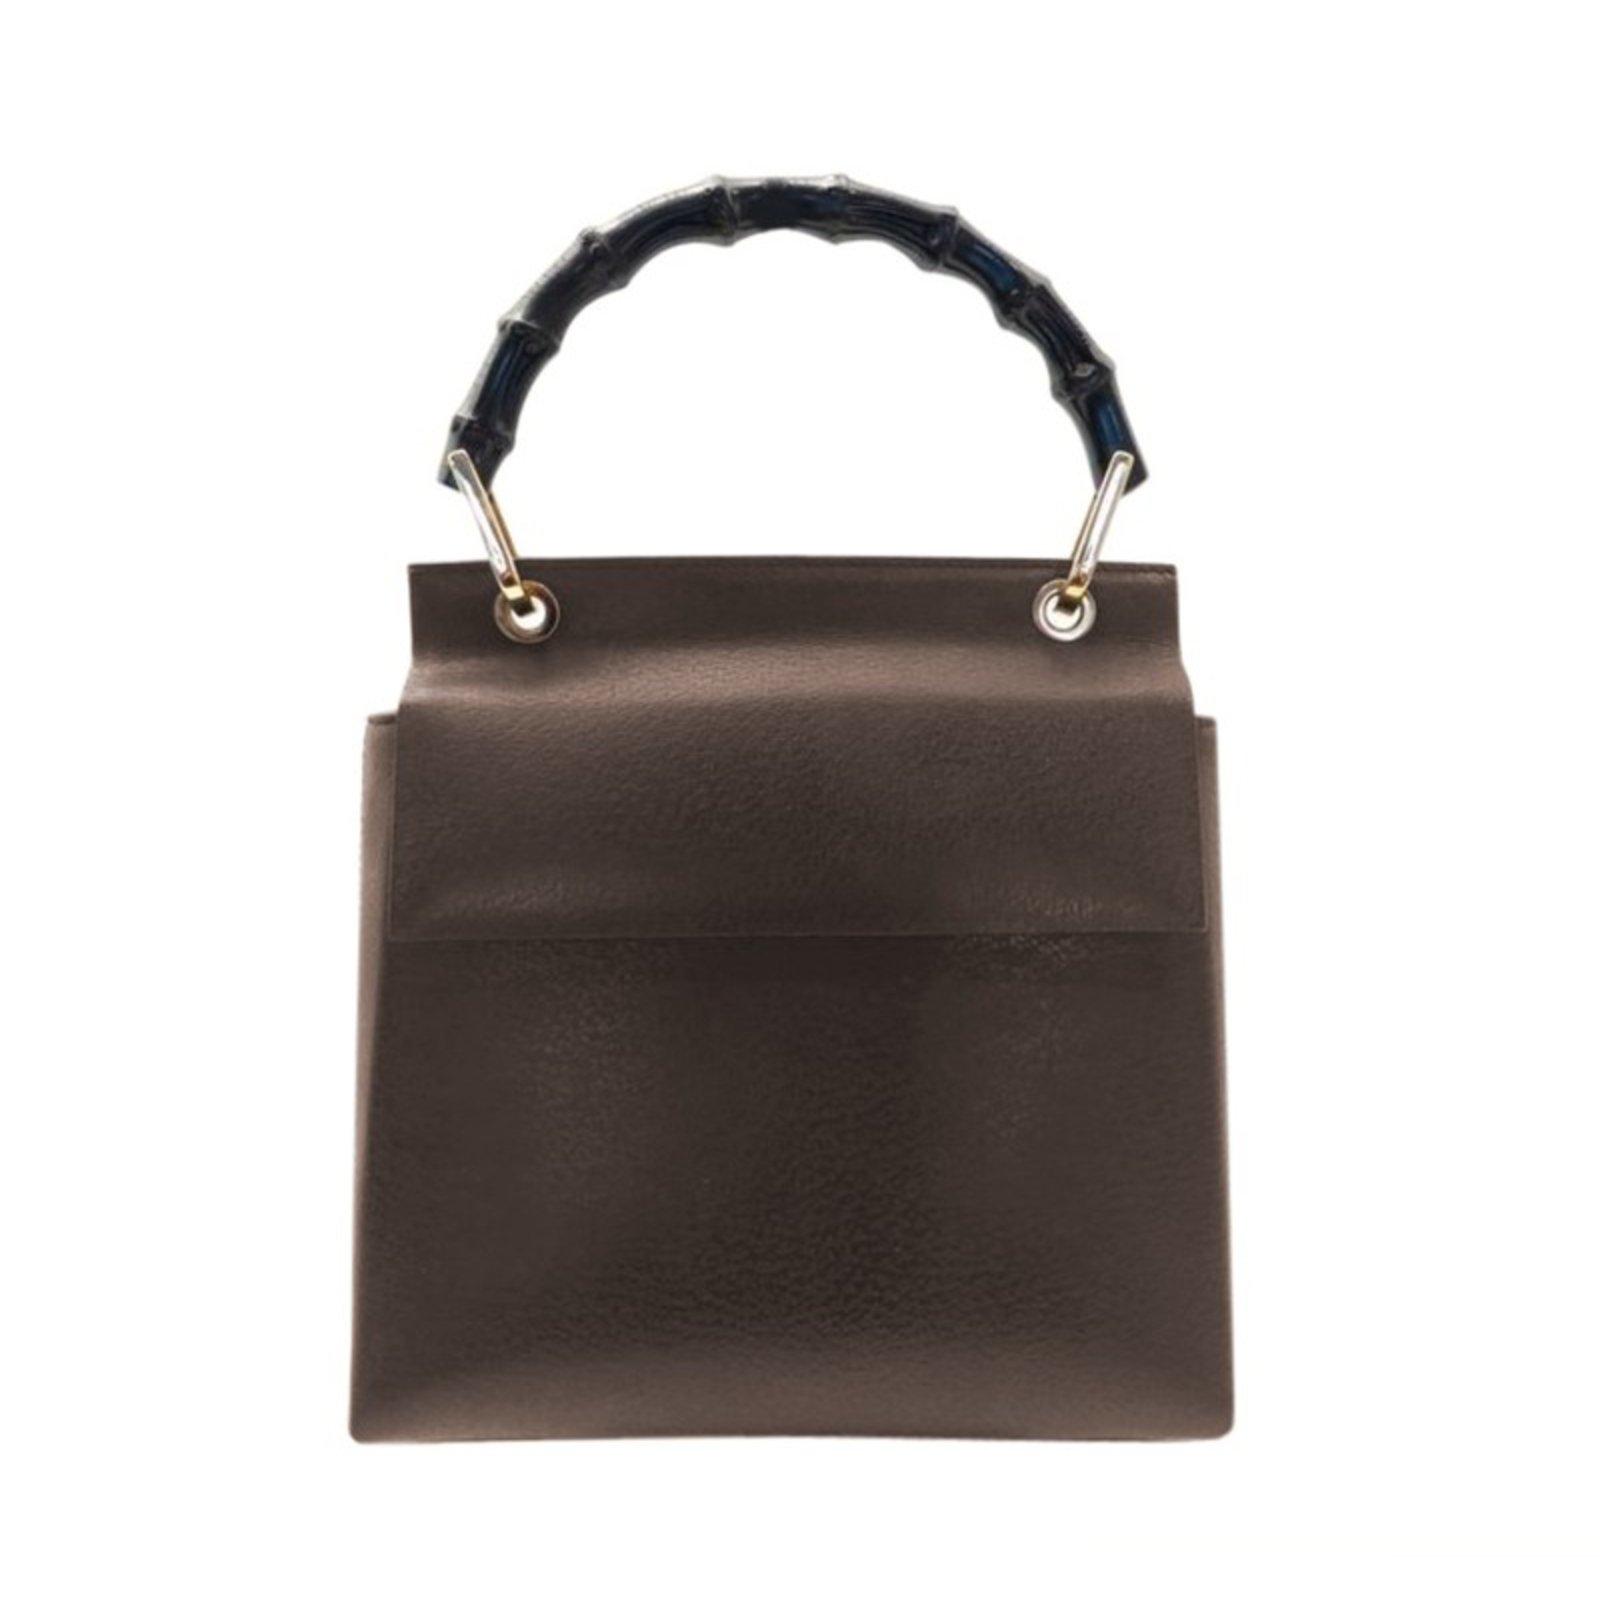 1b95af6094ef Gucci Gucci Metallic and Bamboo Handbag Handbags Leather Brown ref.102508